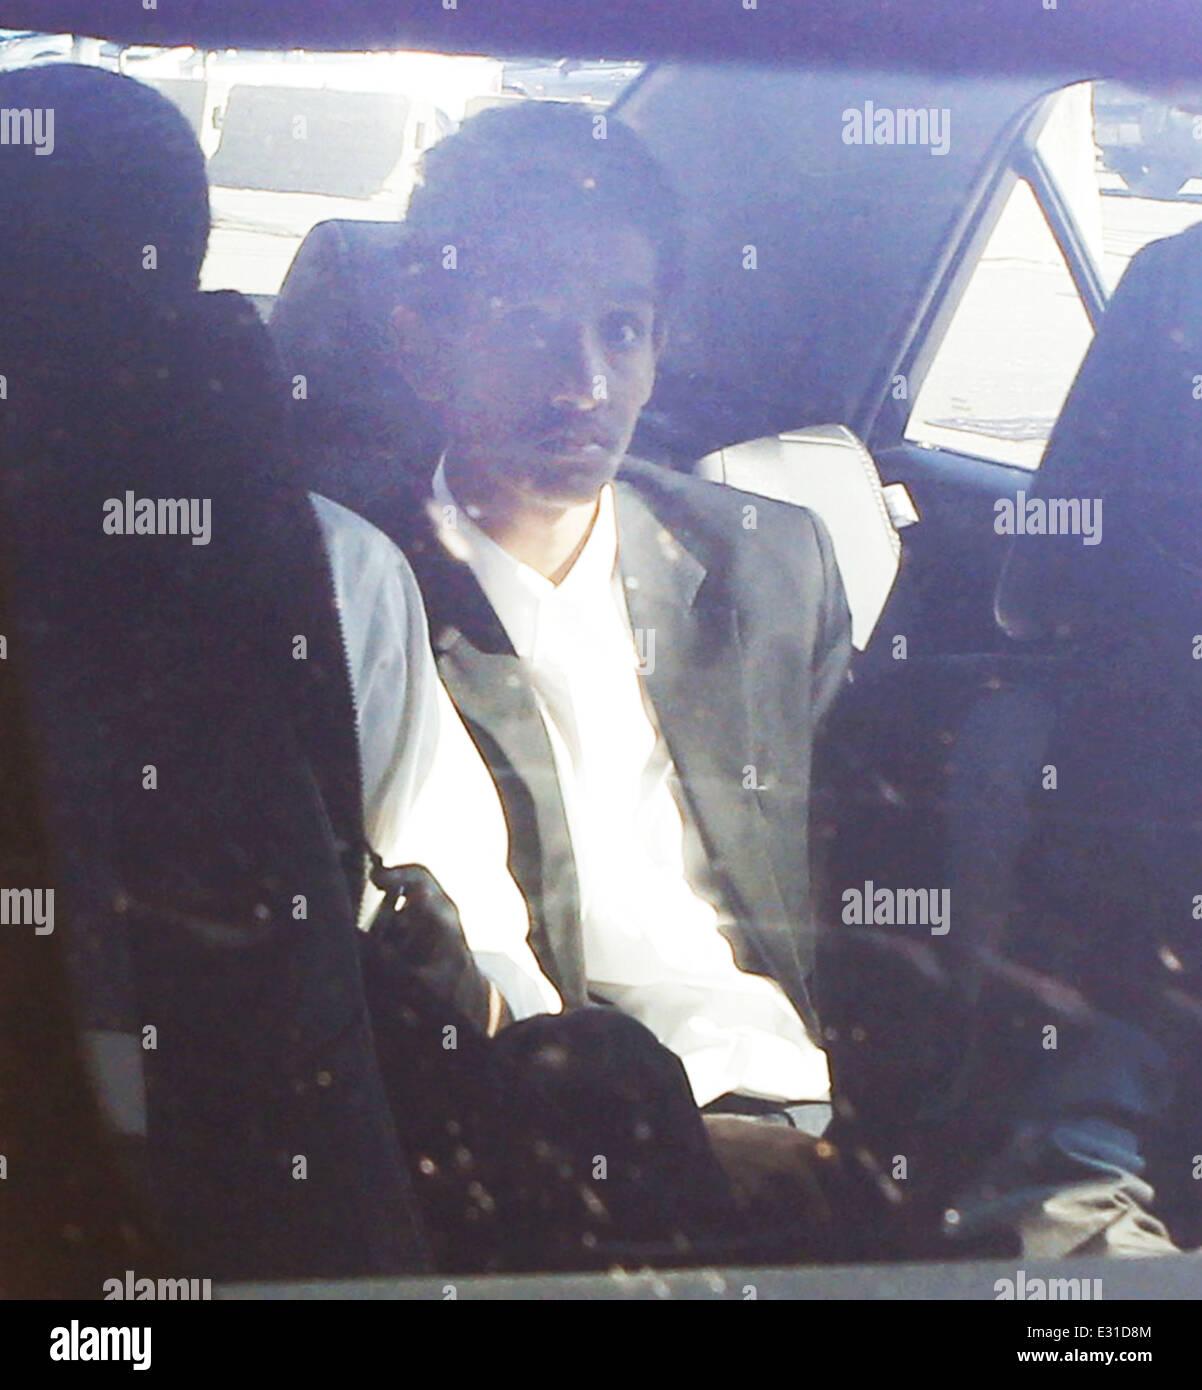 Boston Bombing Suspect Thought To Be Dzhokhar A Tsarnaev: Tsarnaev Stock Photos & Tsarnaev Stock Images